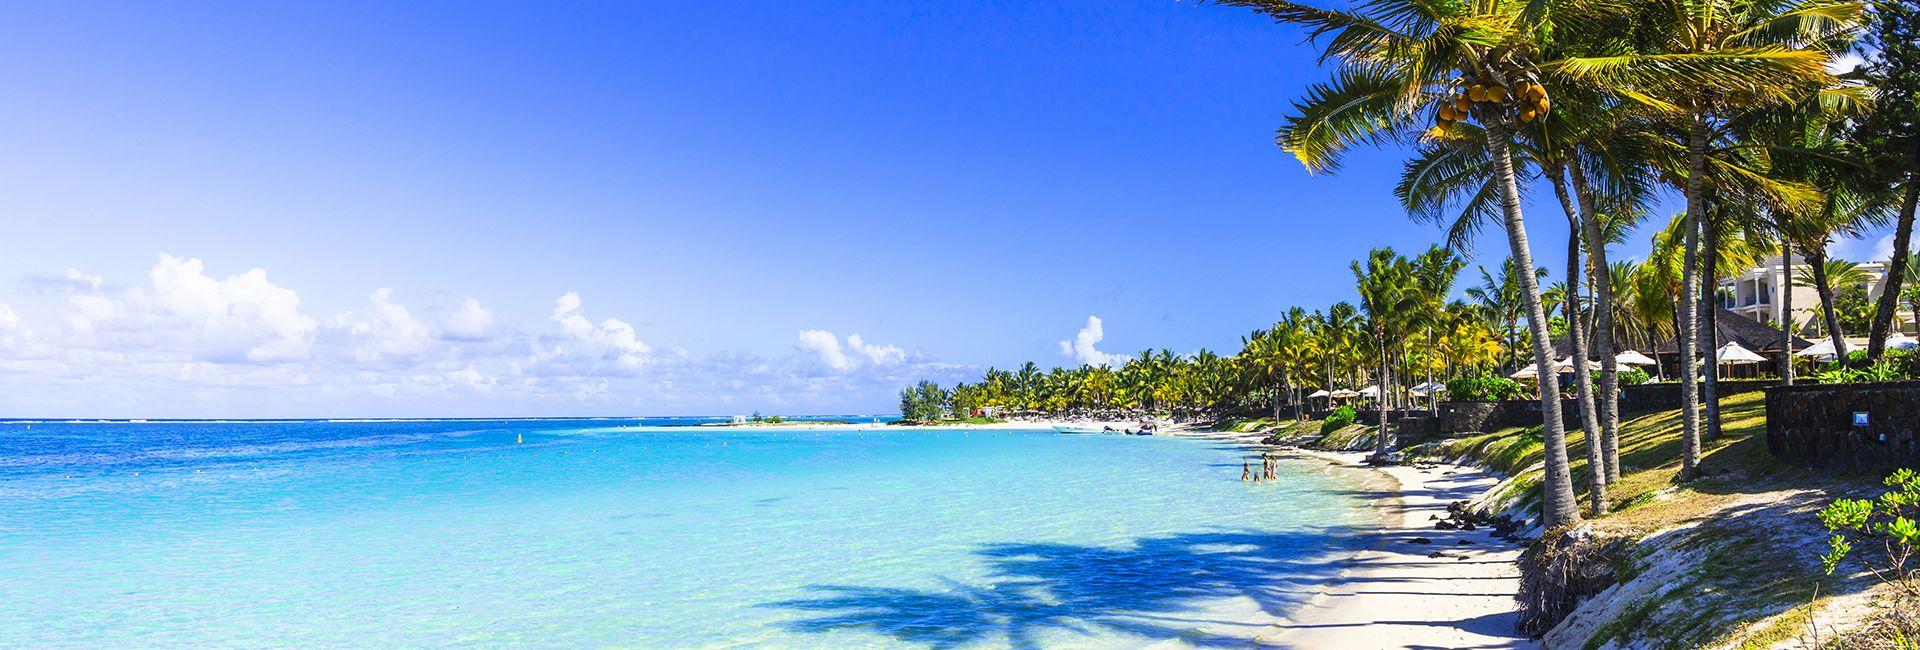 Top 7 bãi biển đẹp nhất ở Penang, Malaysia